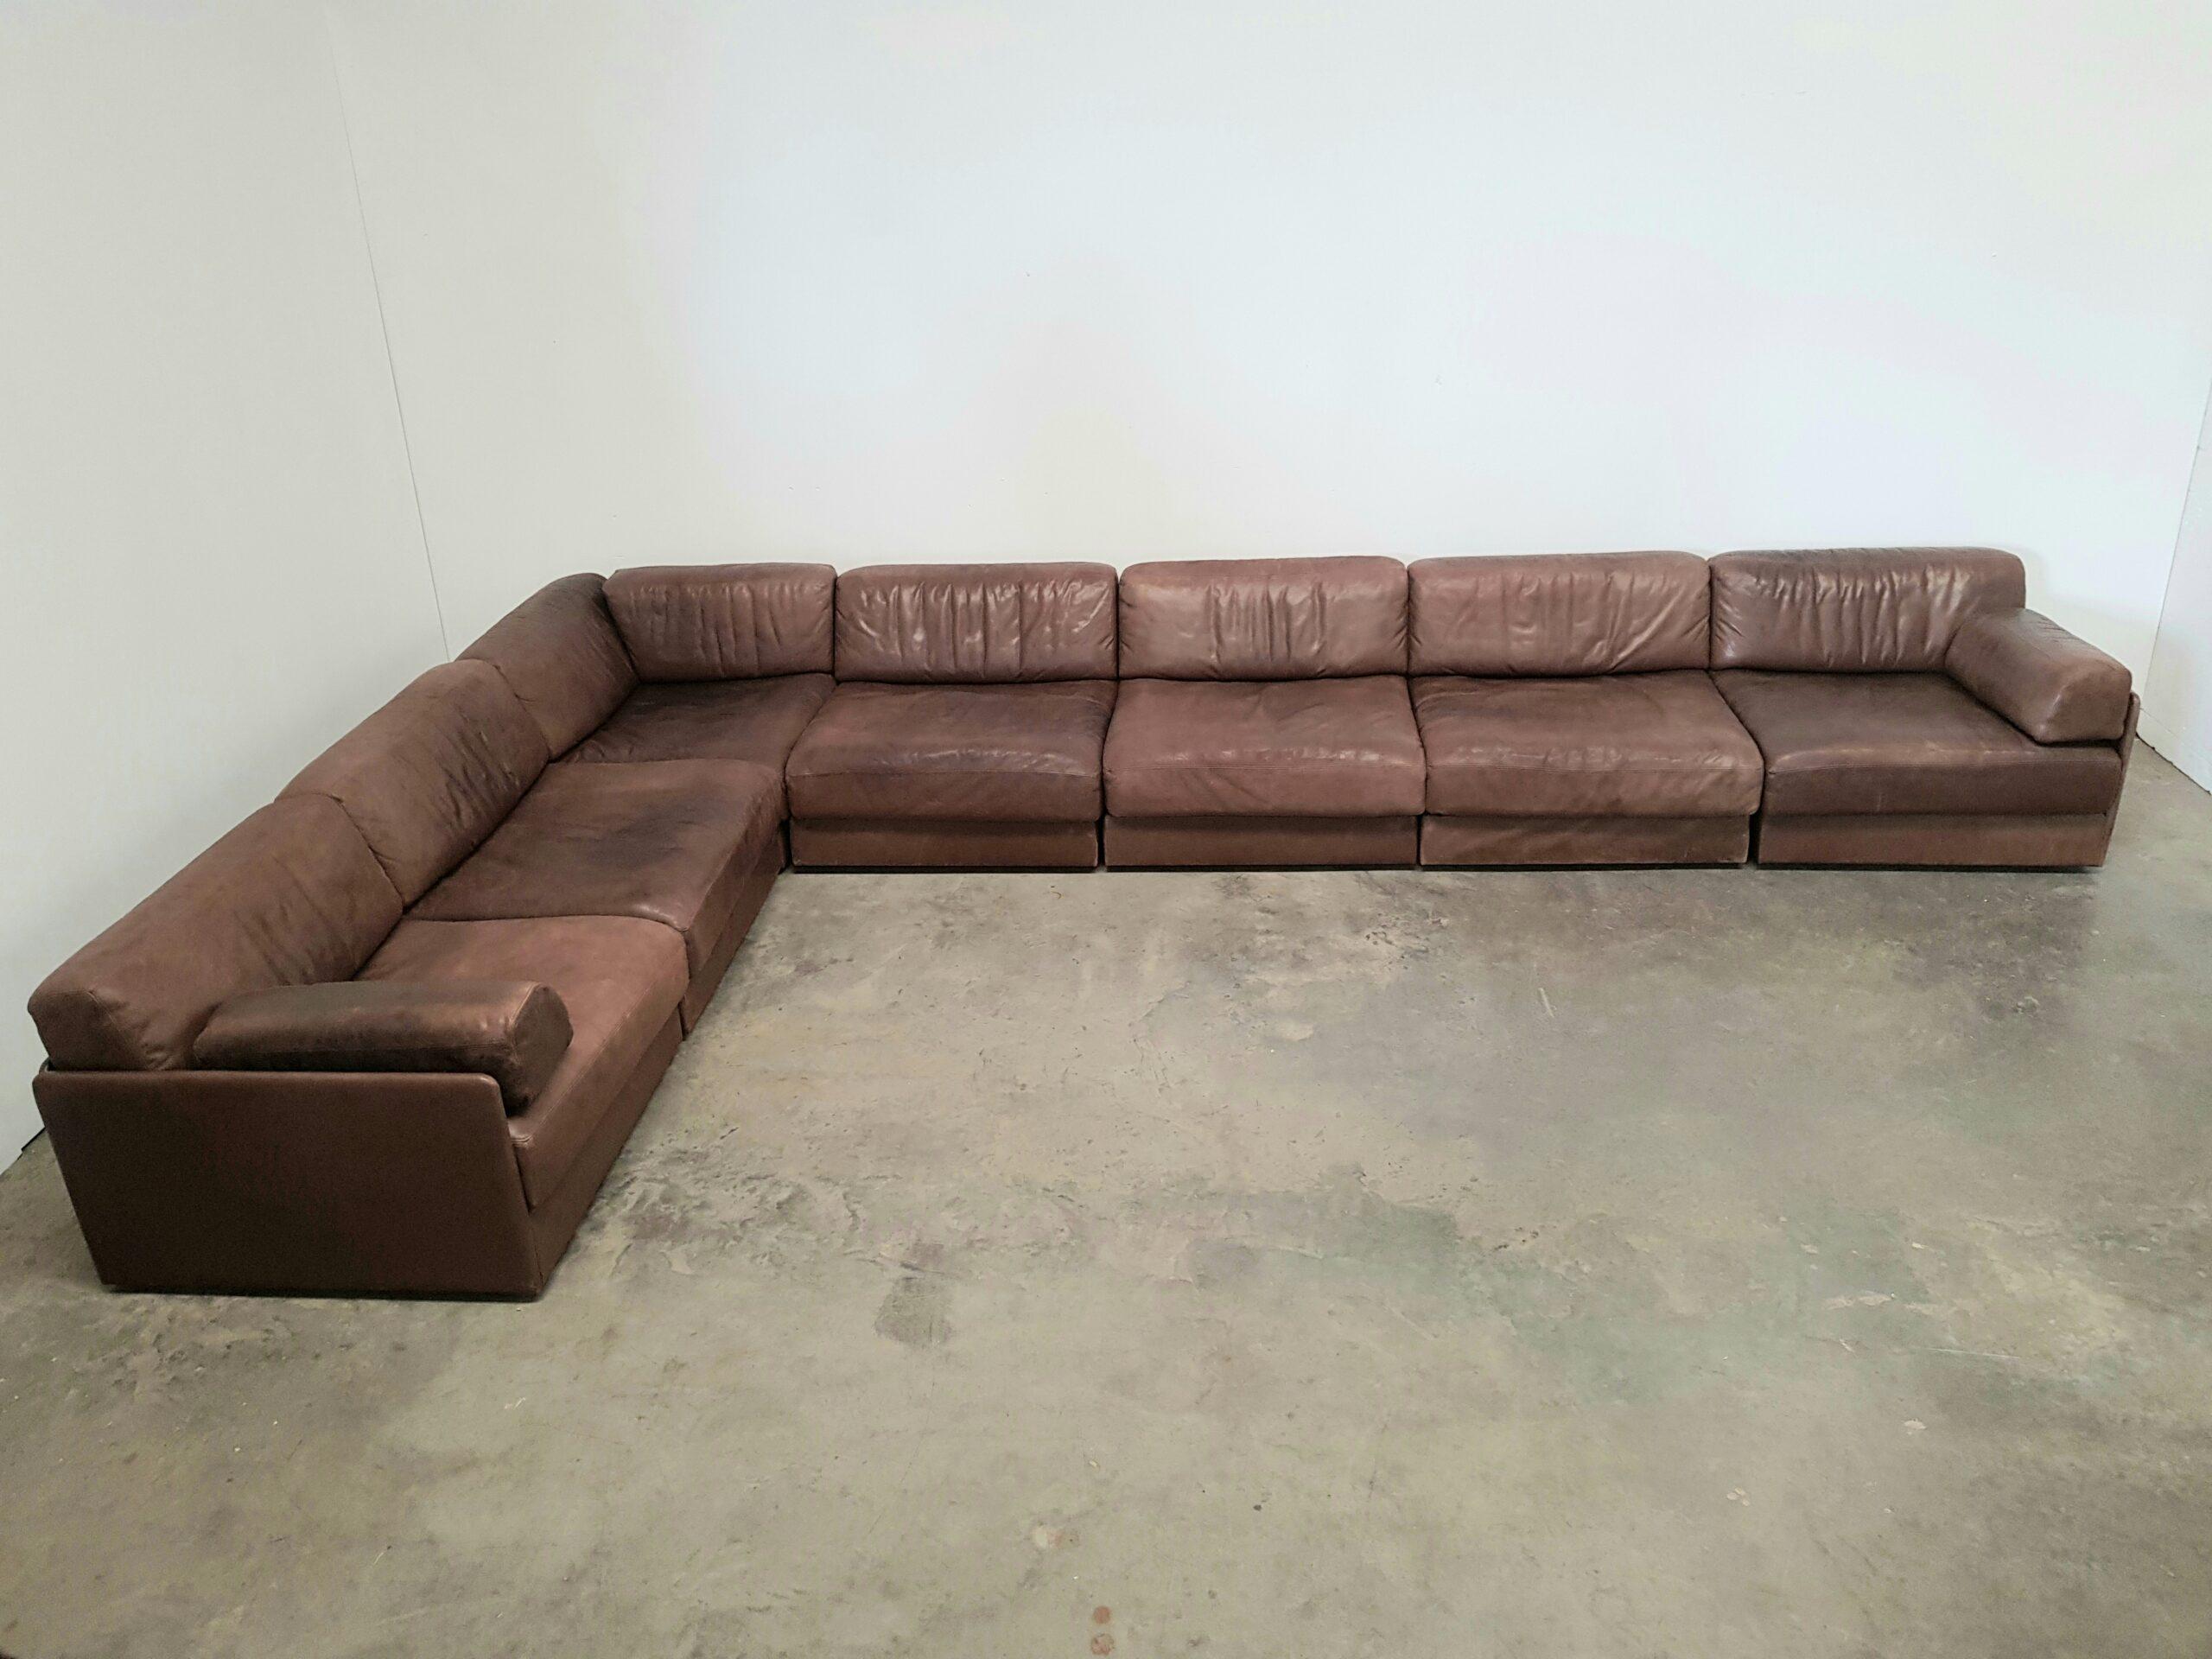 Full Size of De Sede Sofa Couch Gebraucht Preis Leder Ds 600 Furniture Usa Uk Sessel Schweiz Sleeper Preise Used For Sale Kaufen Walter Knoll Samt Englisches Hülsta Big Sofa De Sede Sofa